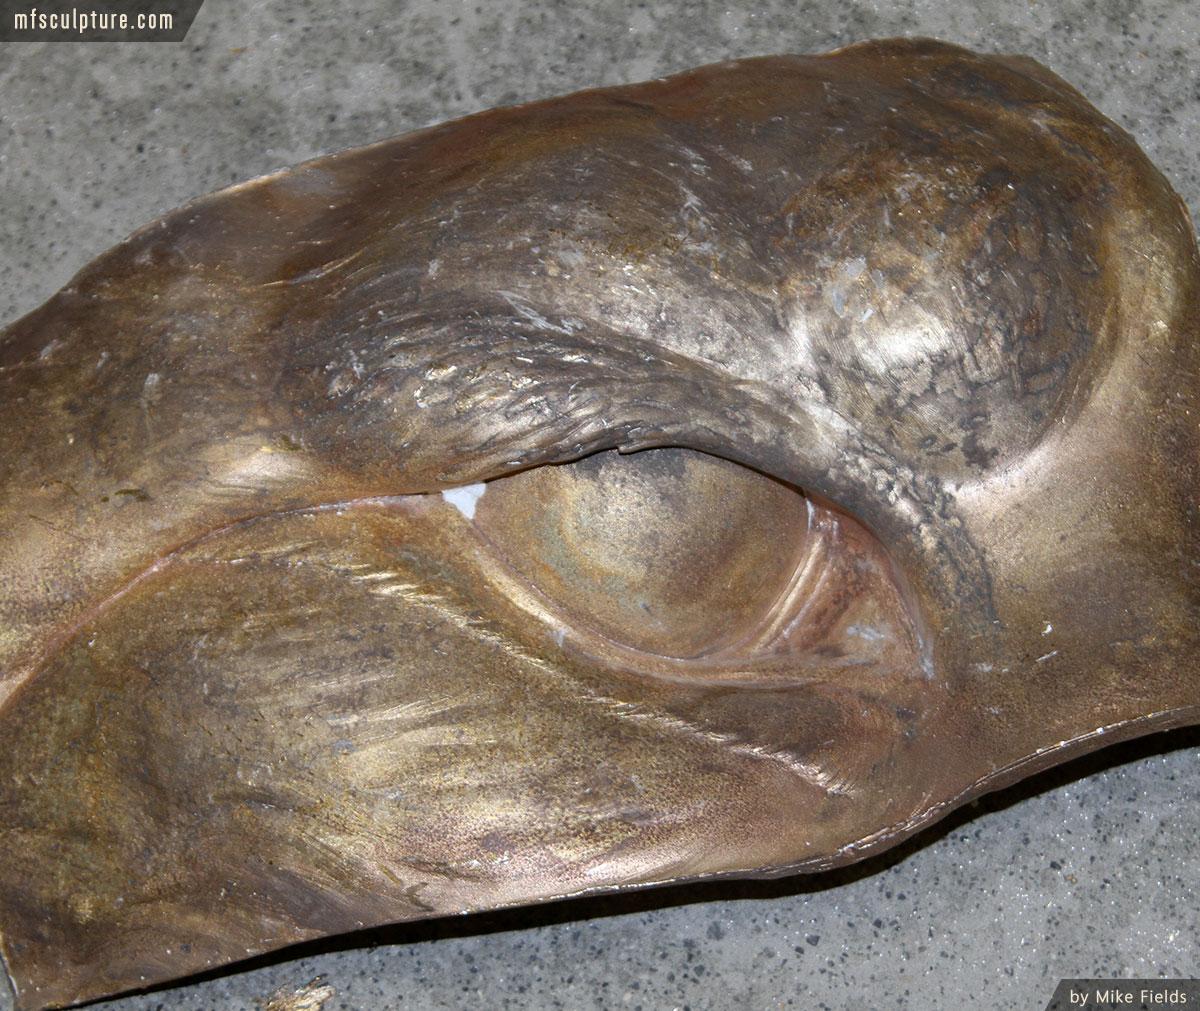 JWU University Wildcat Mascot Lost Wax Investment Casting Bobcat Monument 14